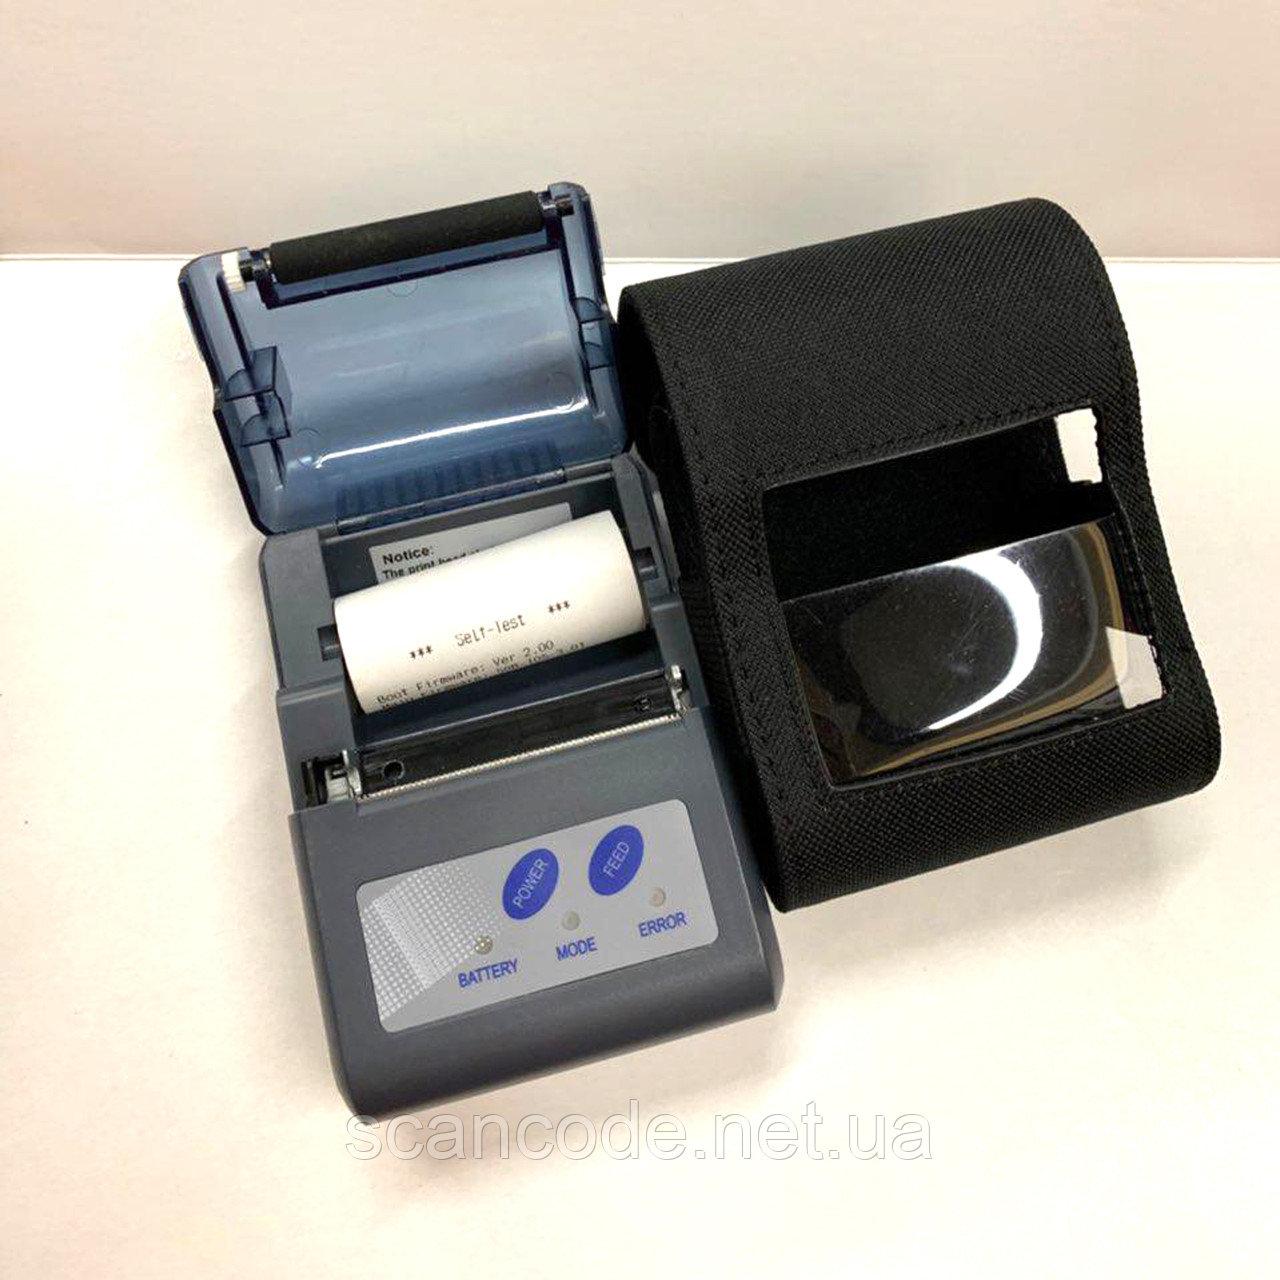 MPT II портативный чековый принтер bluetooth (ширина 58 мм)